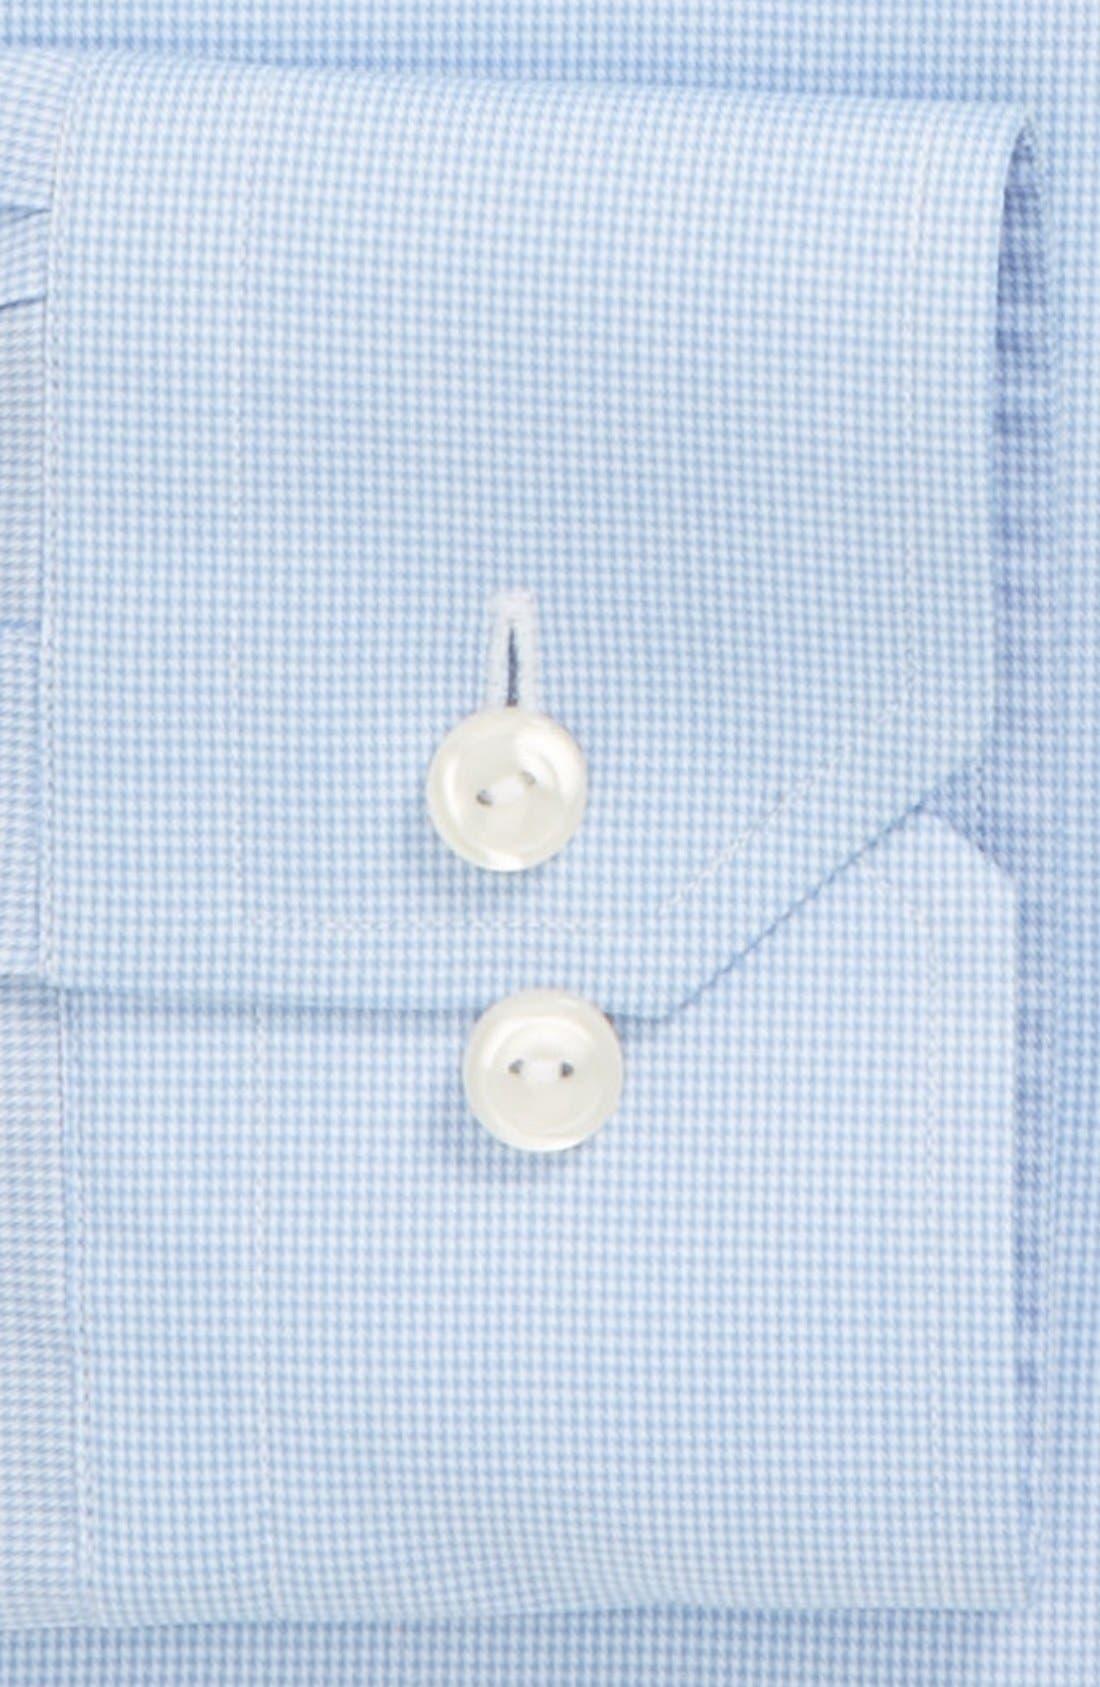 Slim Fit Houndstooth Dress Shirt,                             Alternate thumbnail 3, color,                             400